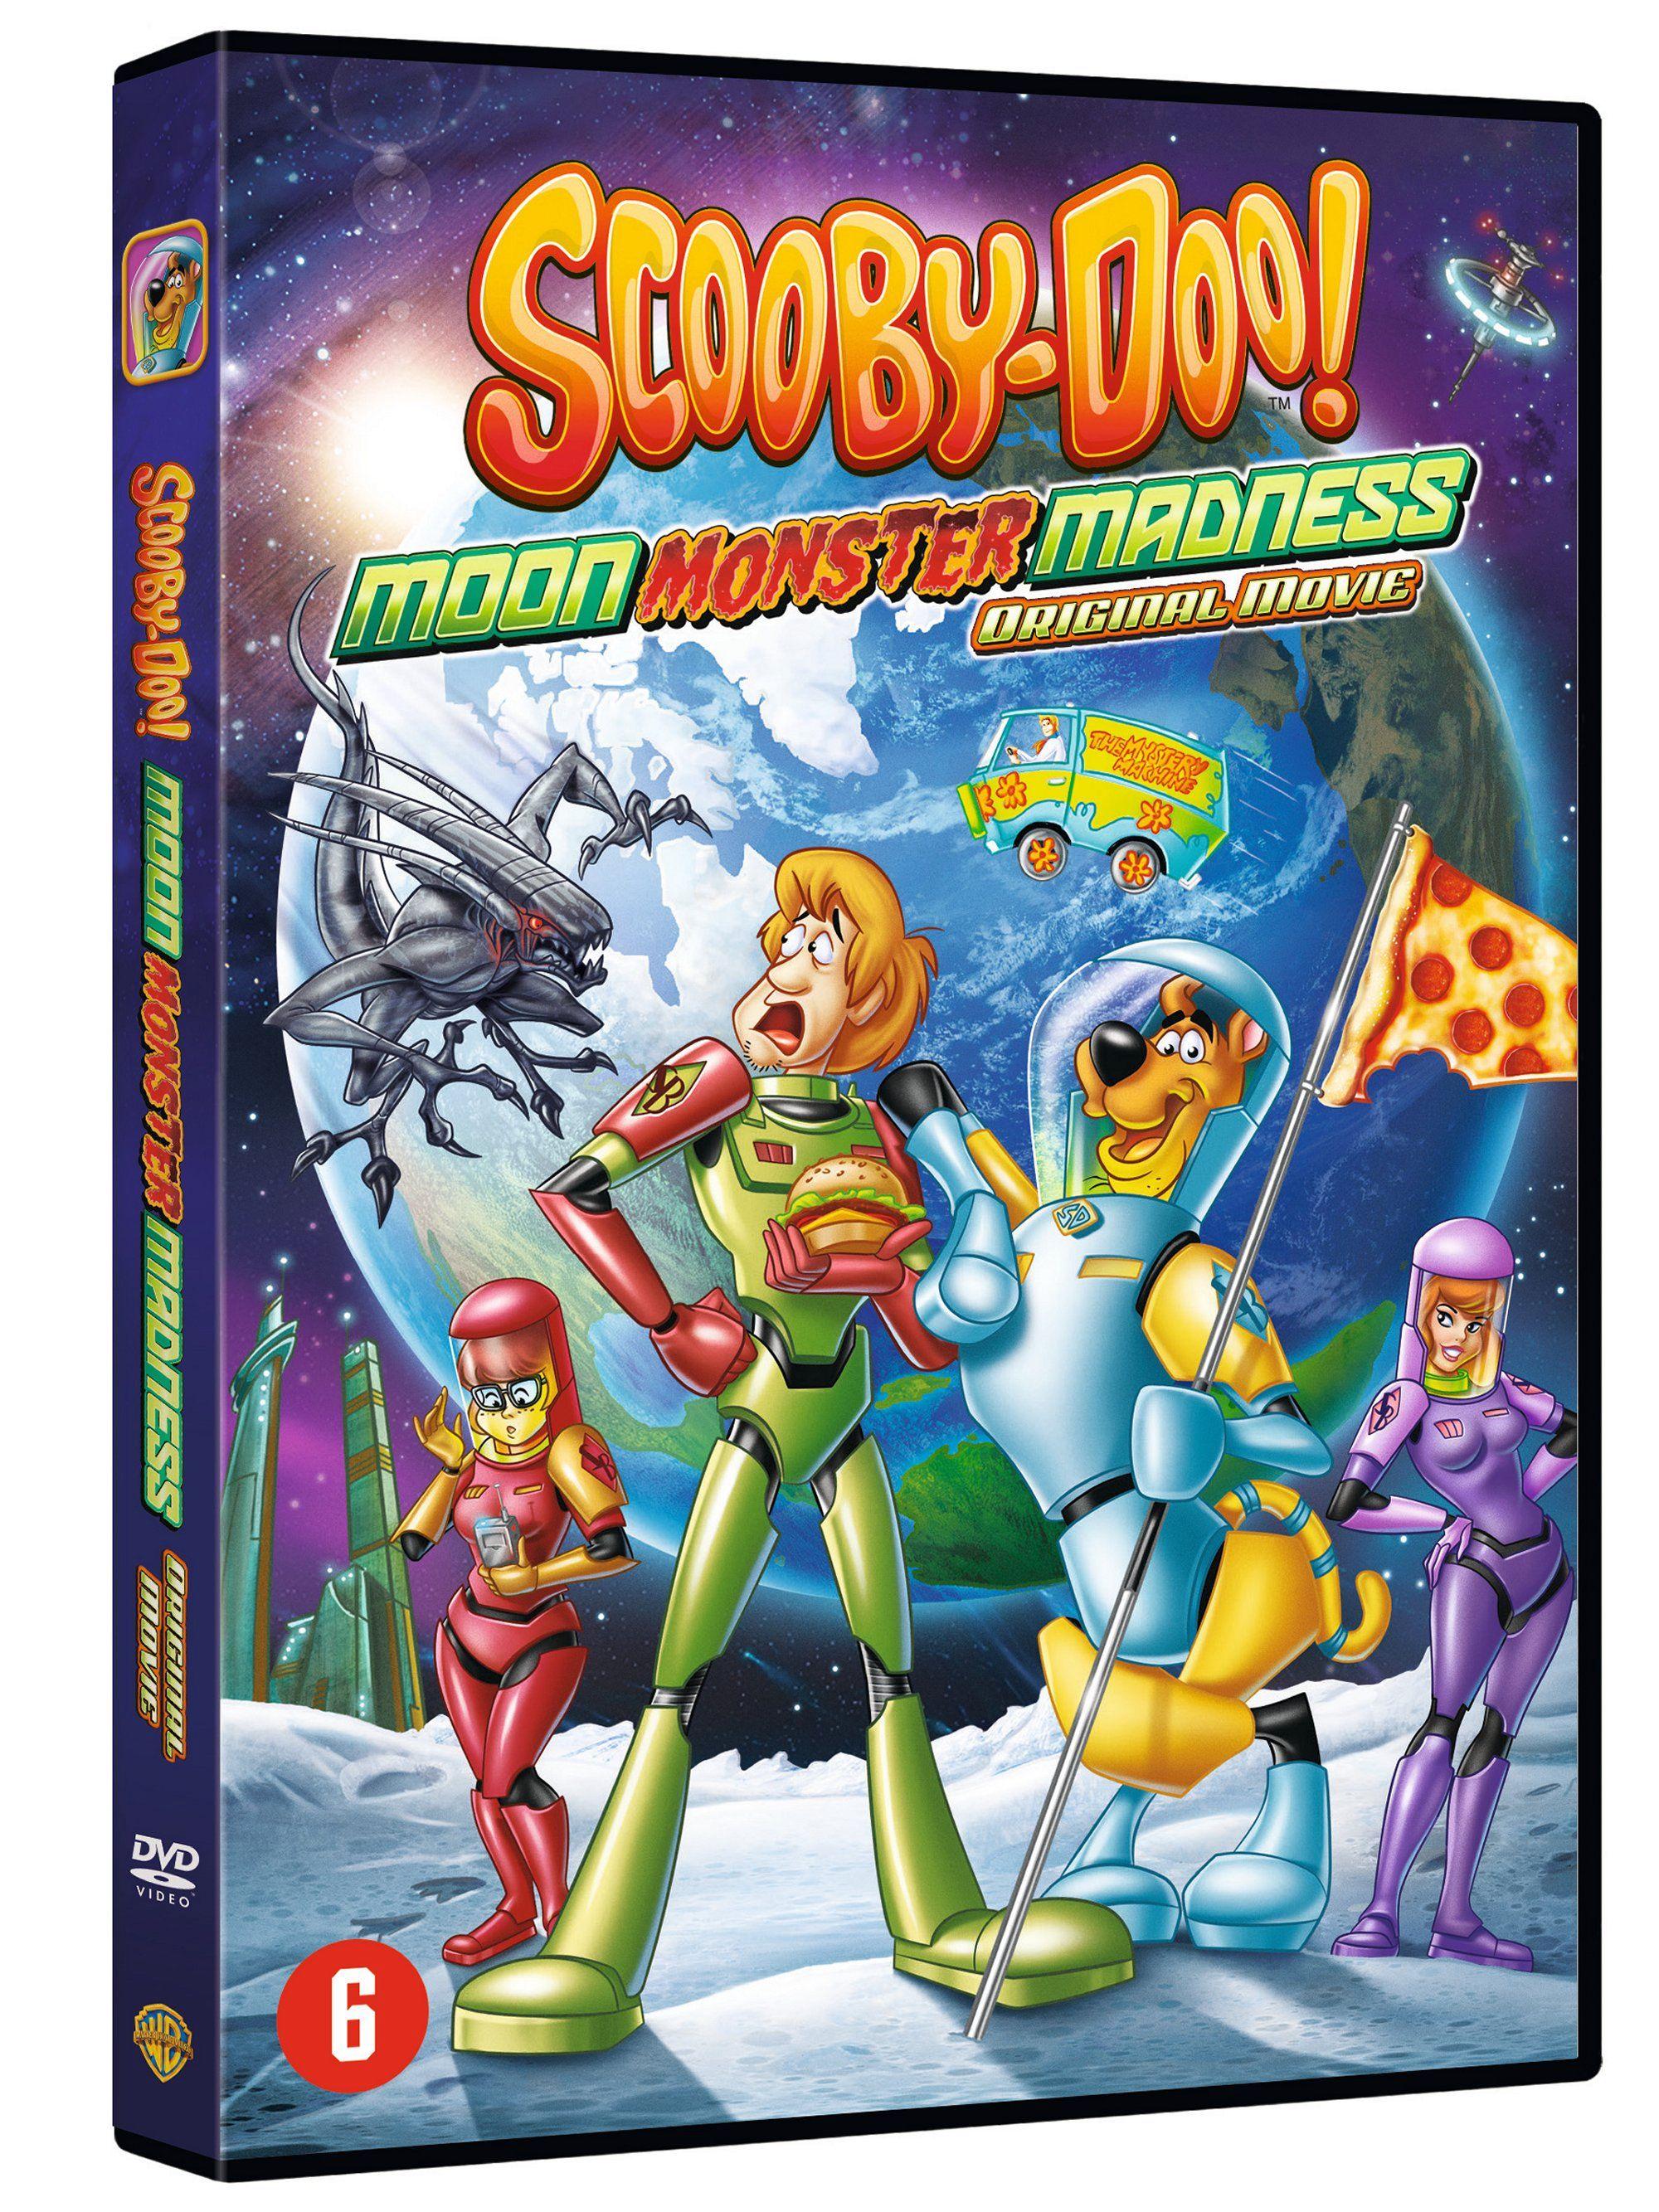 Scooby Doo Pora Ksiezycowego Potwora / Scooby-Doo Moon Monster Madness